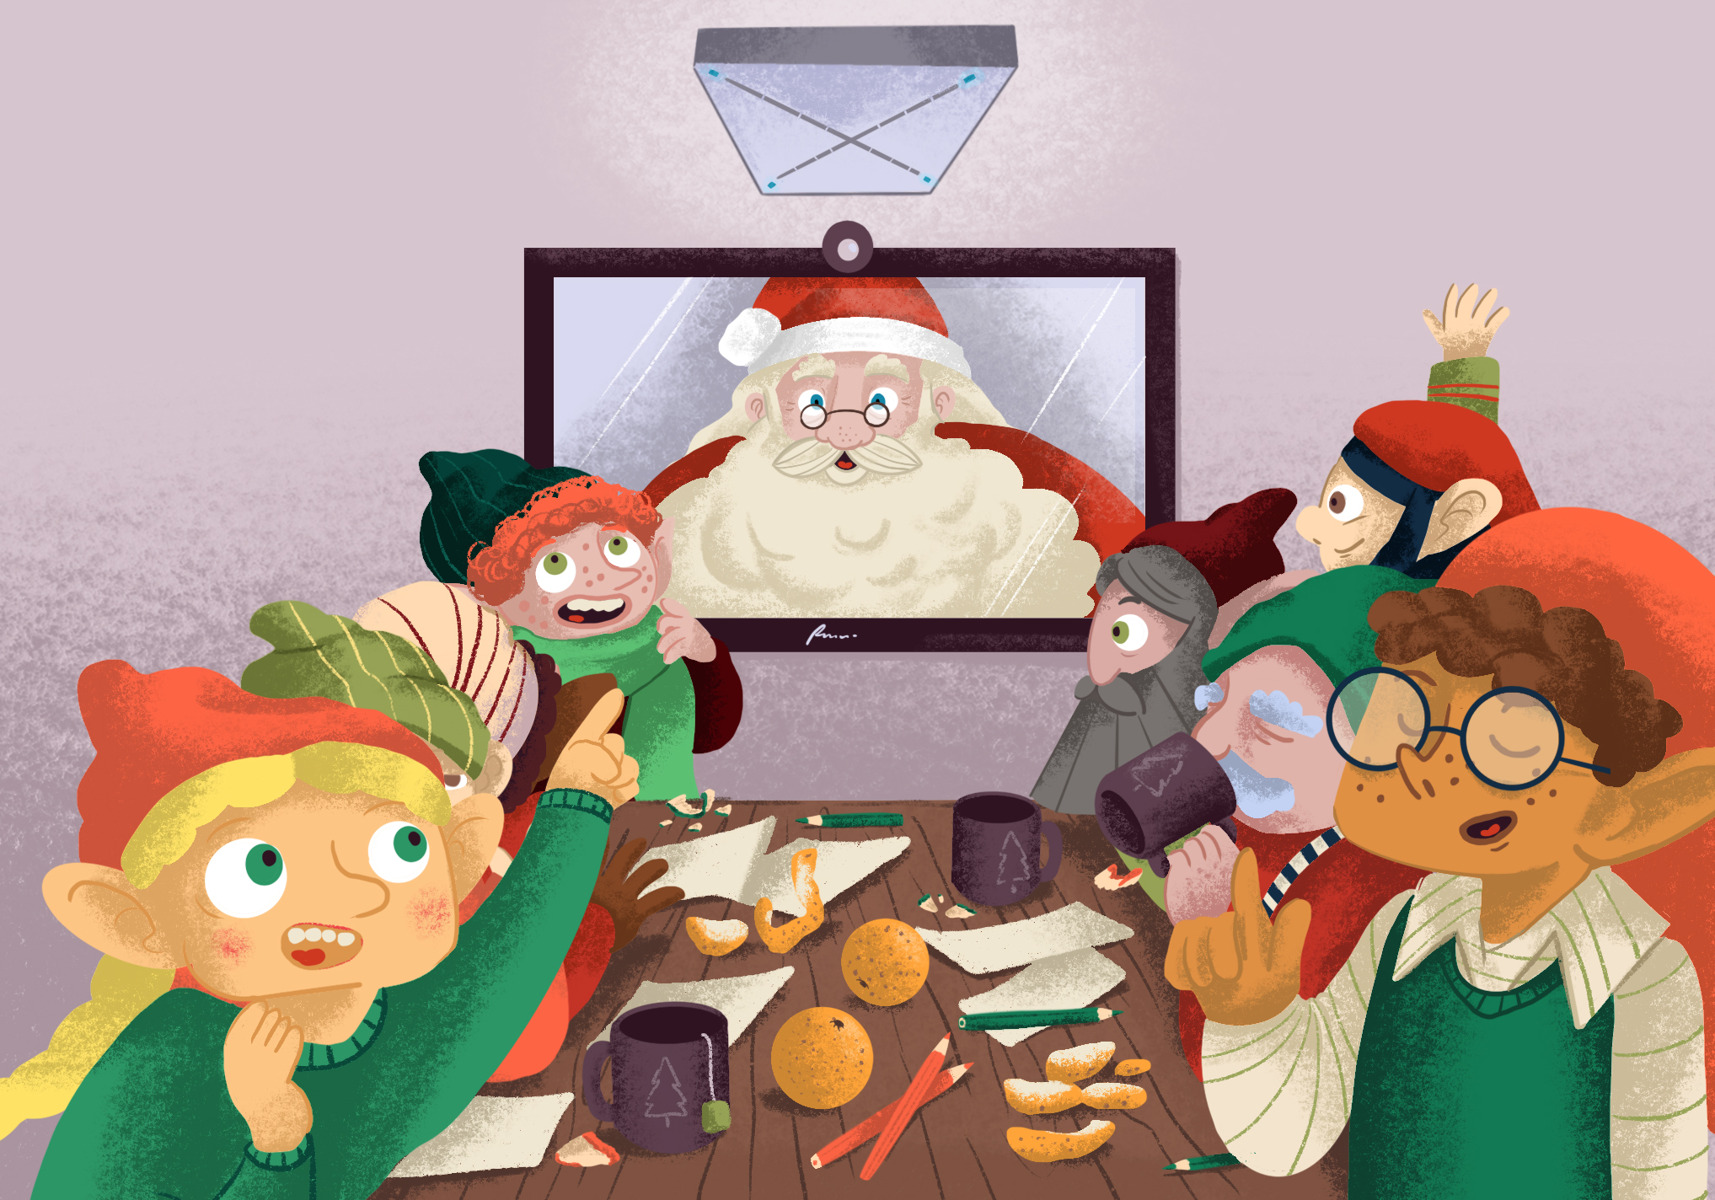 How a microphone saved Christmas